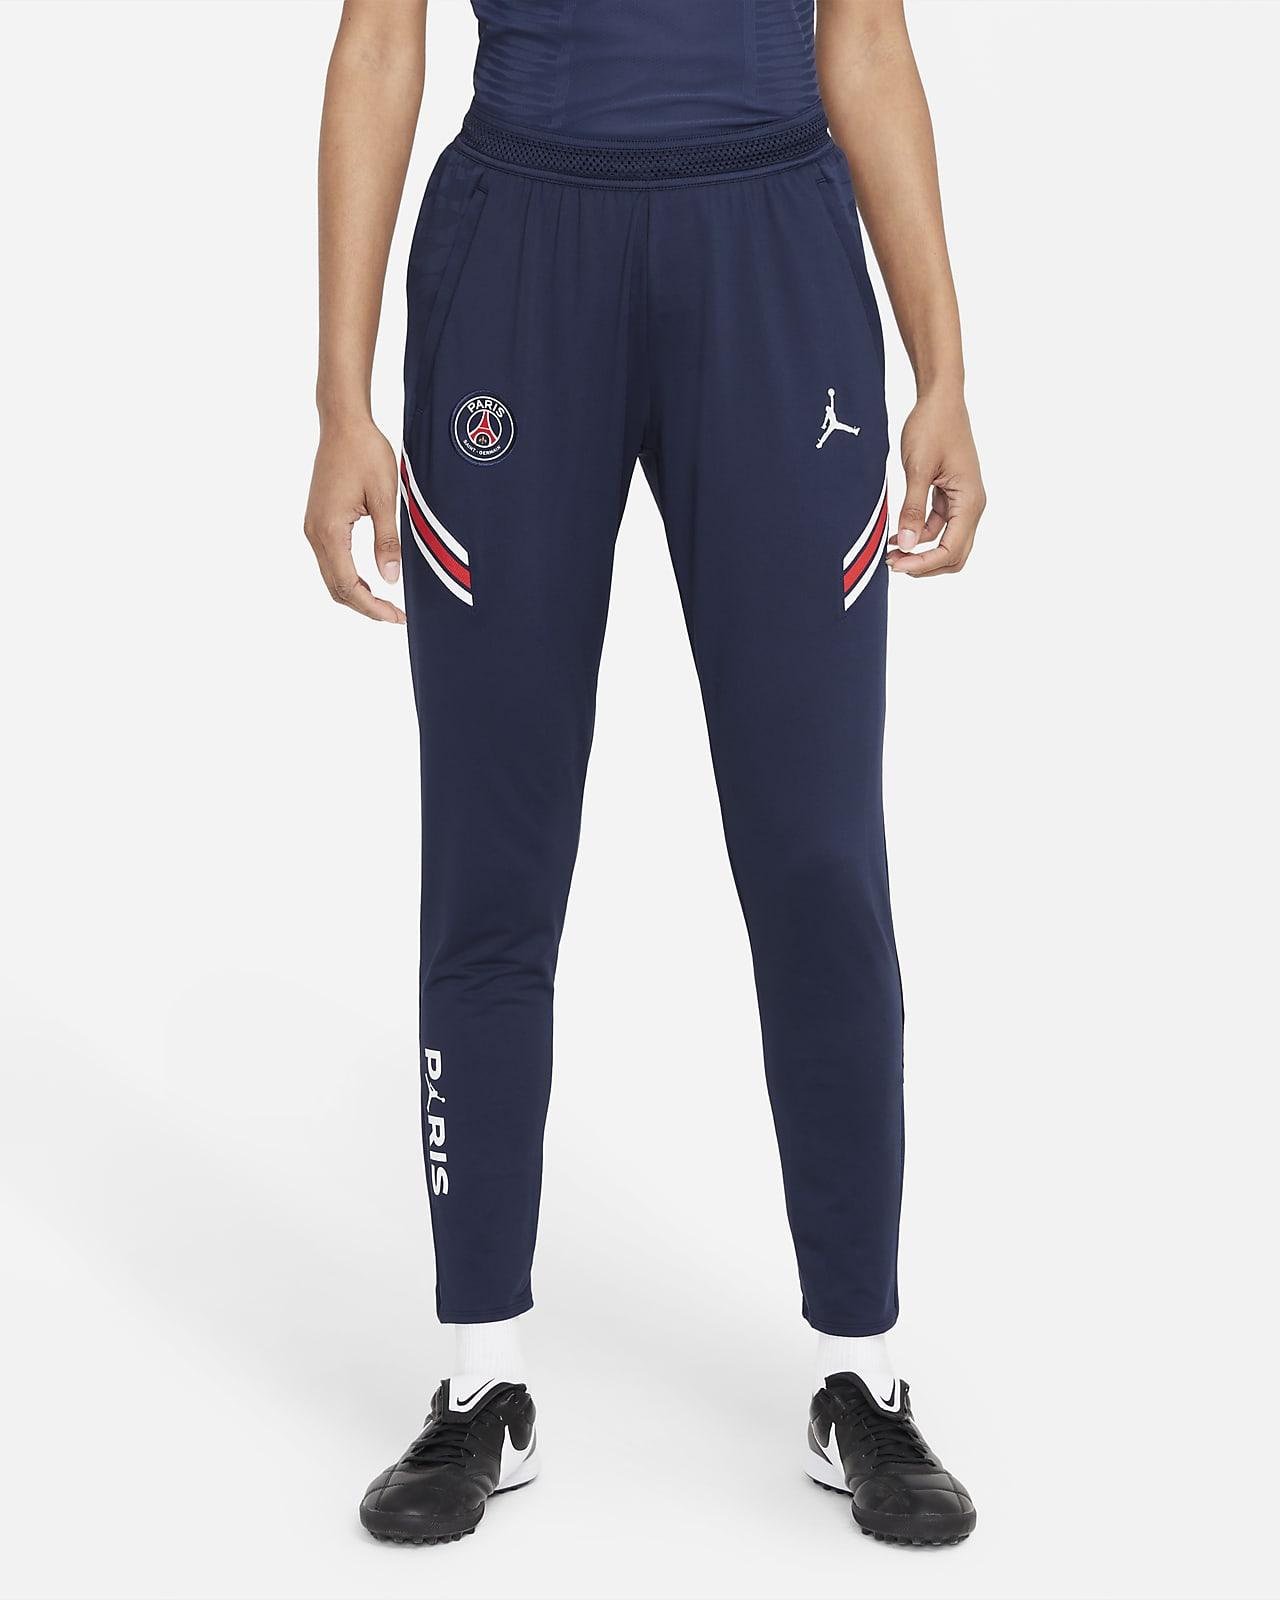 Paris Saint-Germain Strike Women's Nike Dri-FIT Football Pants